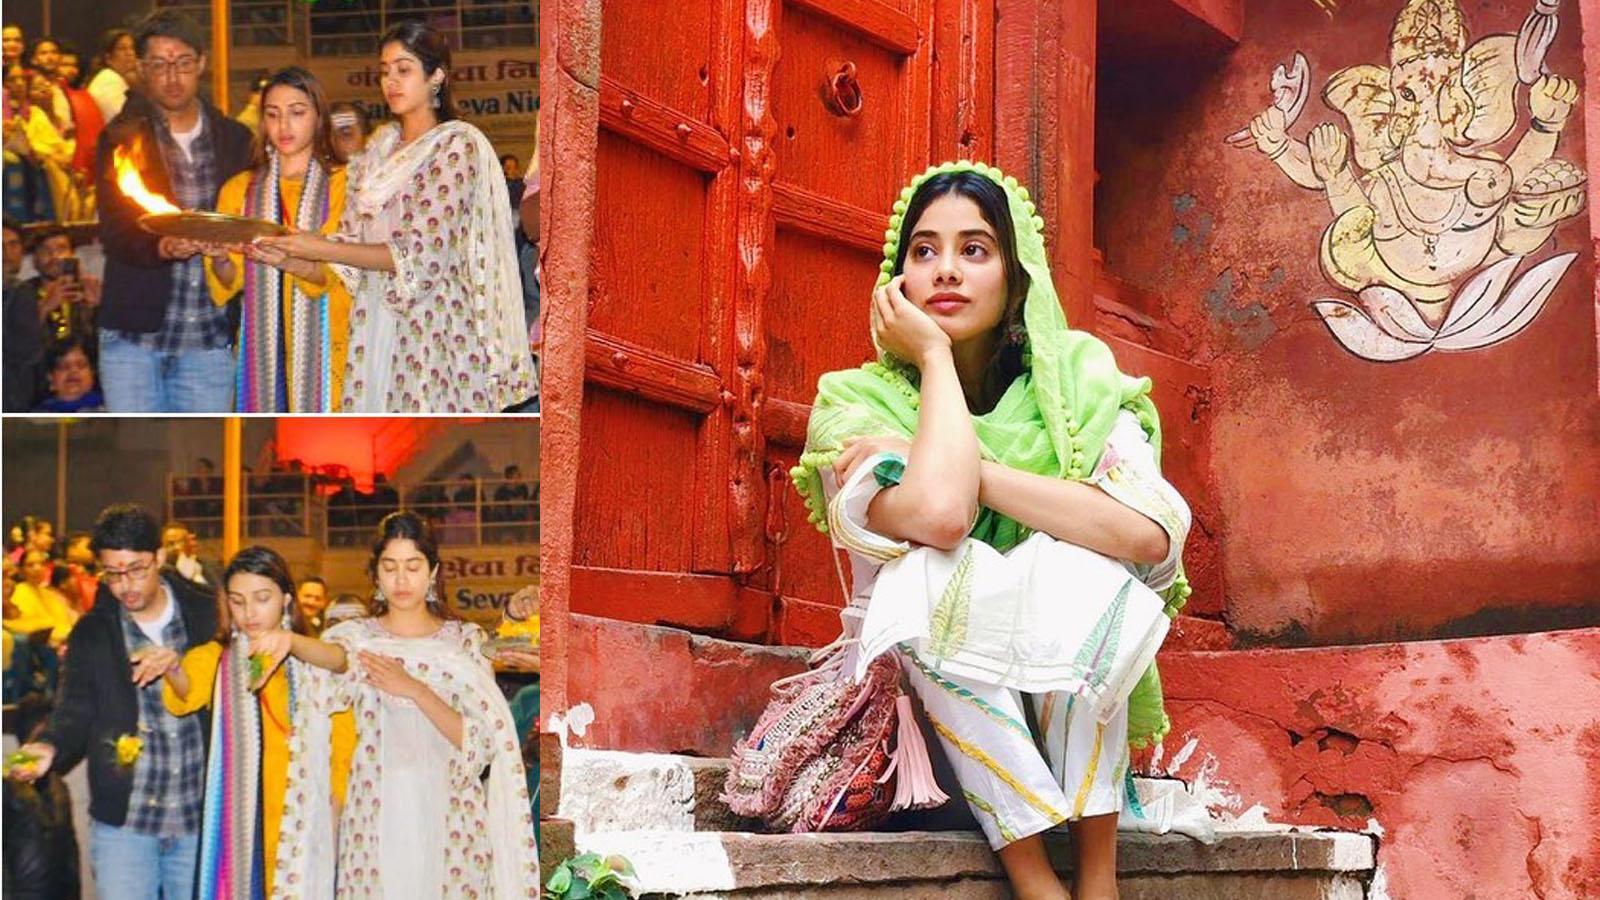 Janhvi Kapoor gives a sneak-peak into her Varanasi trip, performs Ganga aarti with friends